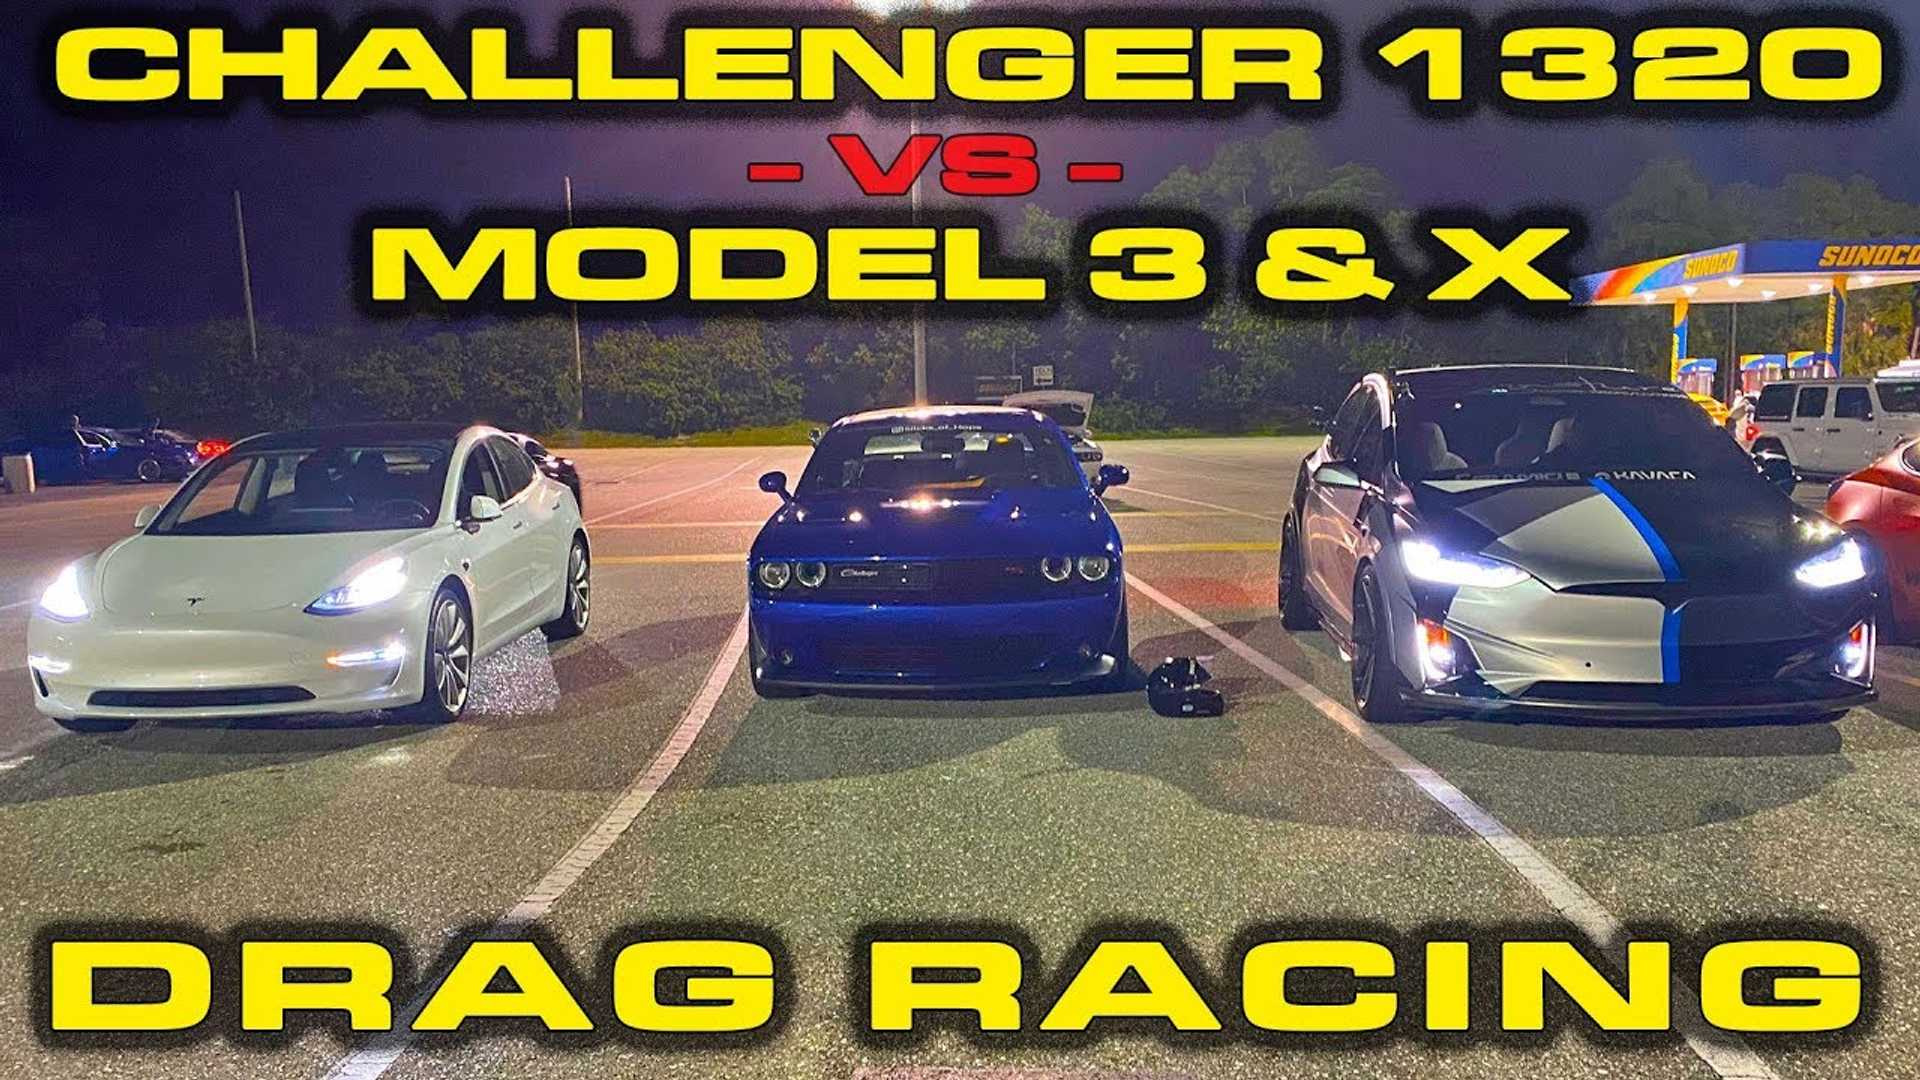 Dodge Challenger R/T Scat Pack 1320 Drag Races Tesla Model 3, X